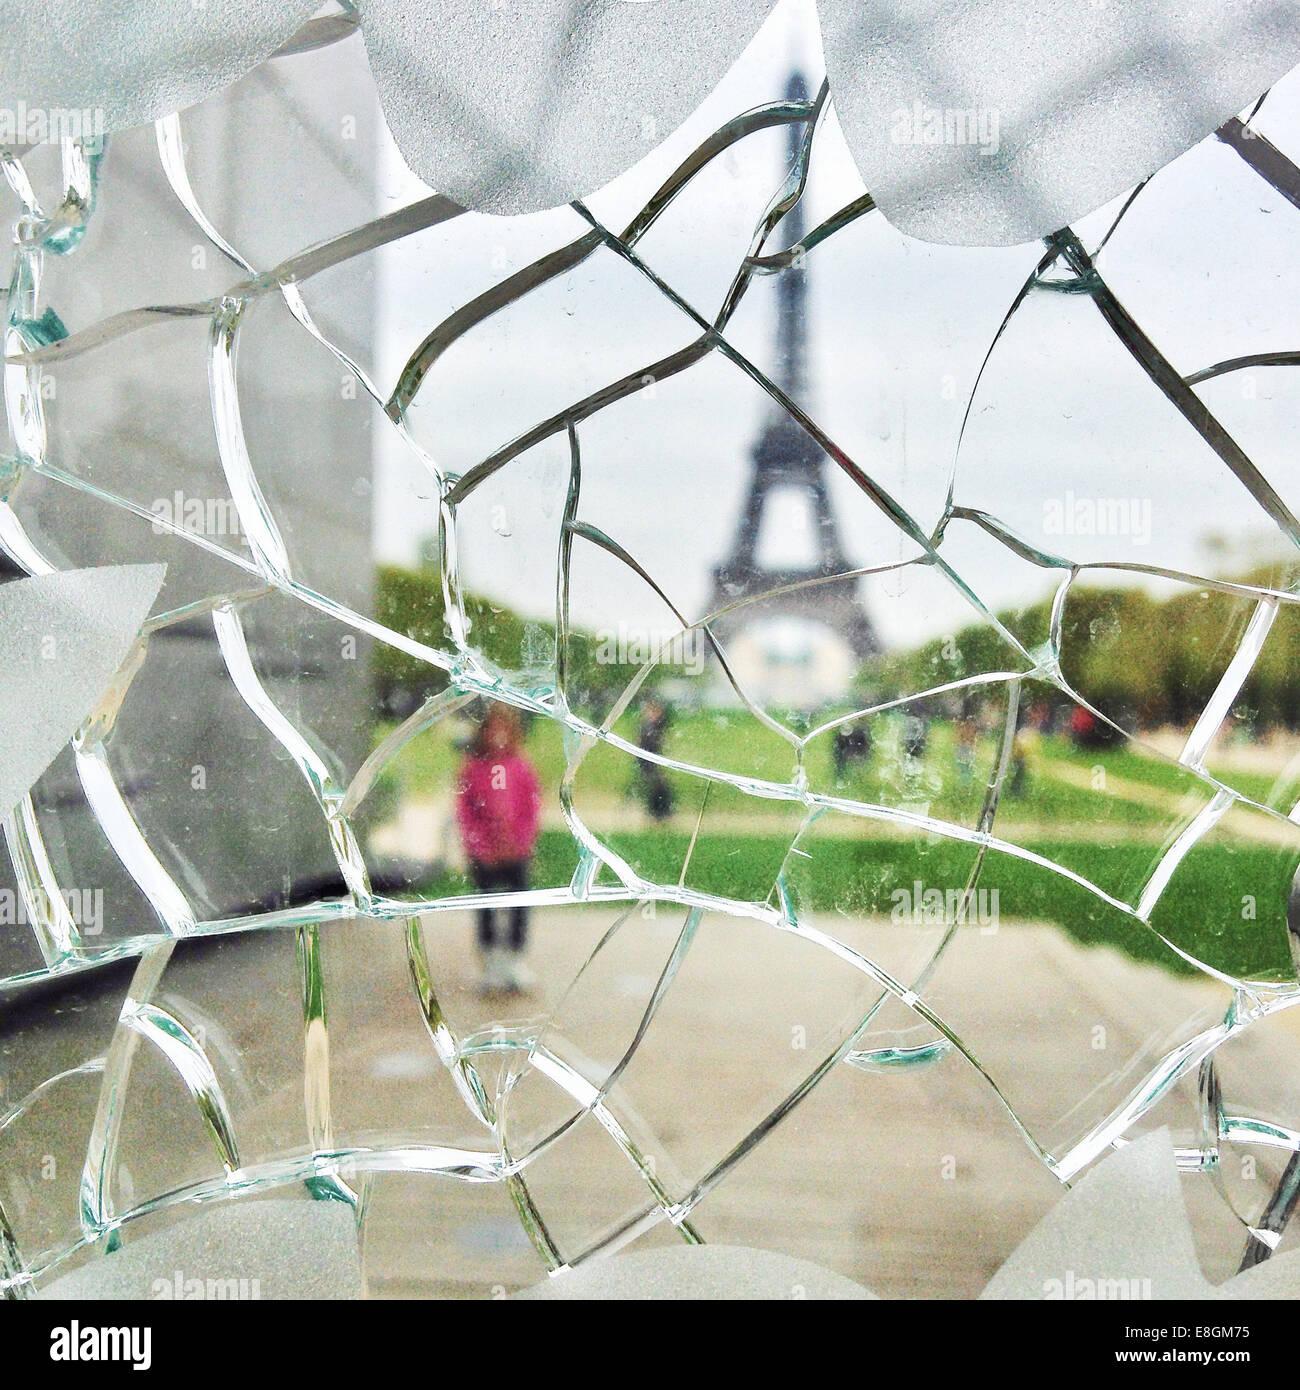 Francia, Paris, Torre Eiffel, vistos a través del panel de vidrio agrietado Imagen De Stock